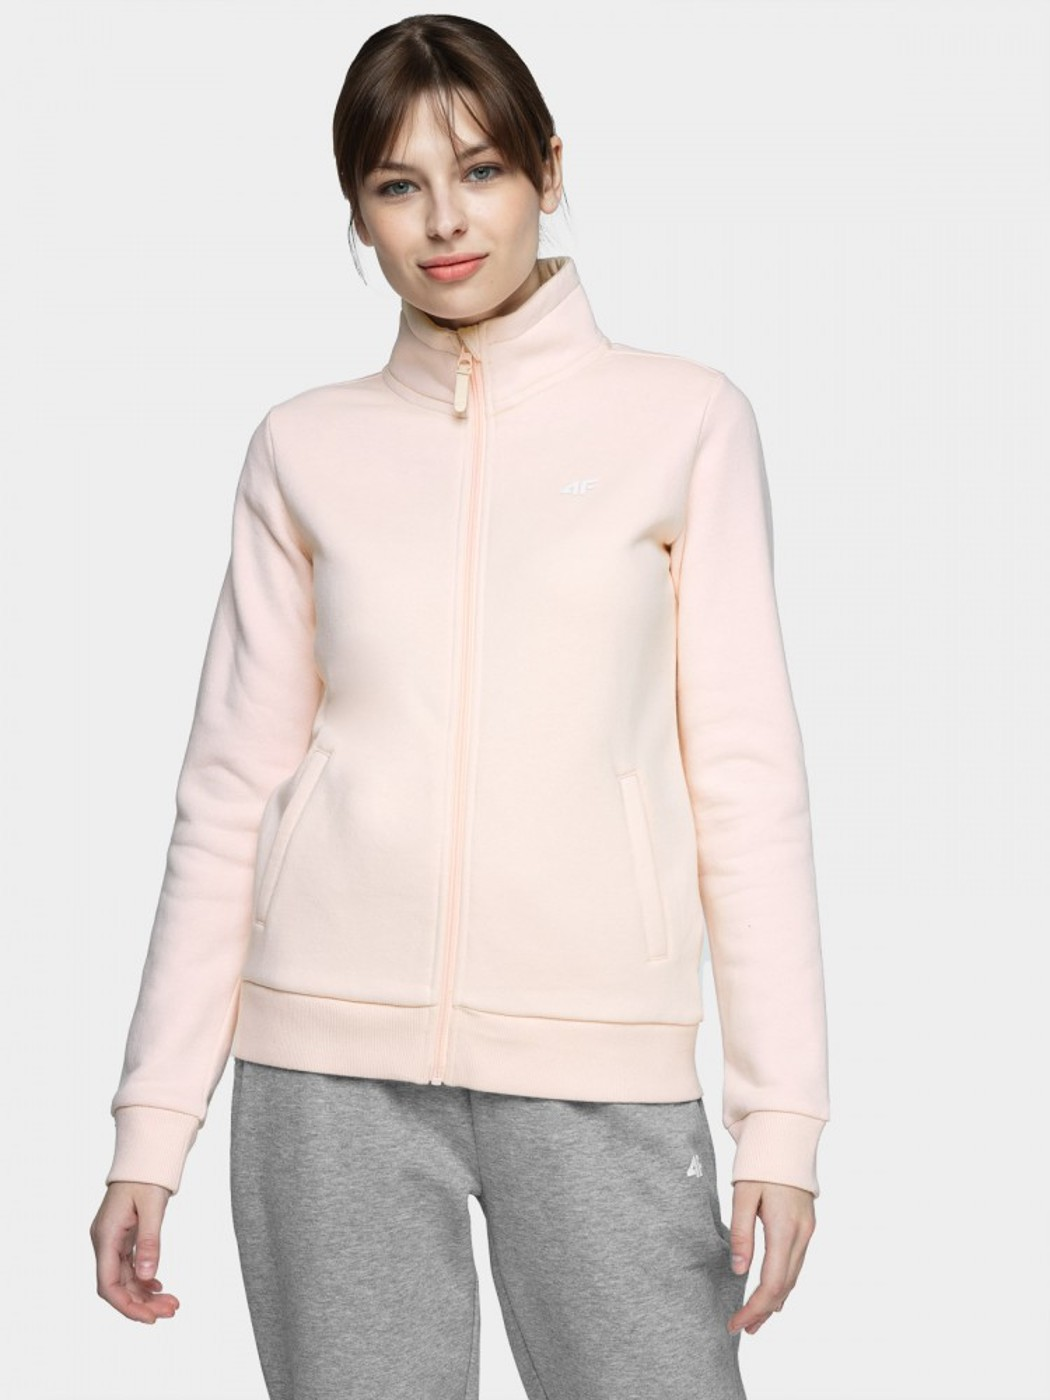 4F BLD003 Sweatshirt - Damen